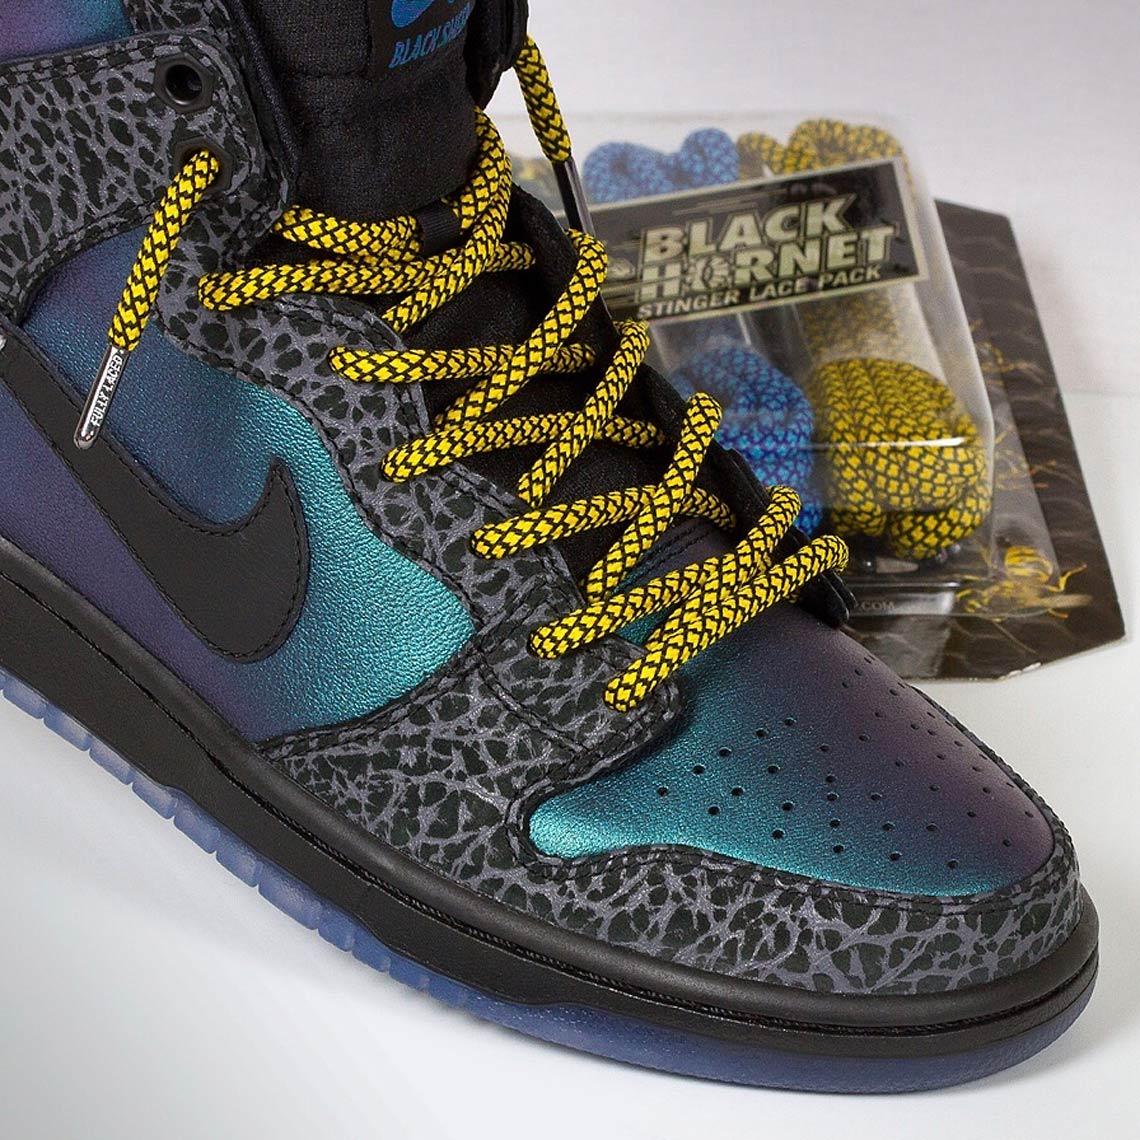 Black Sheep Nike SB Dunk High Black Hornet Info